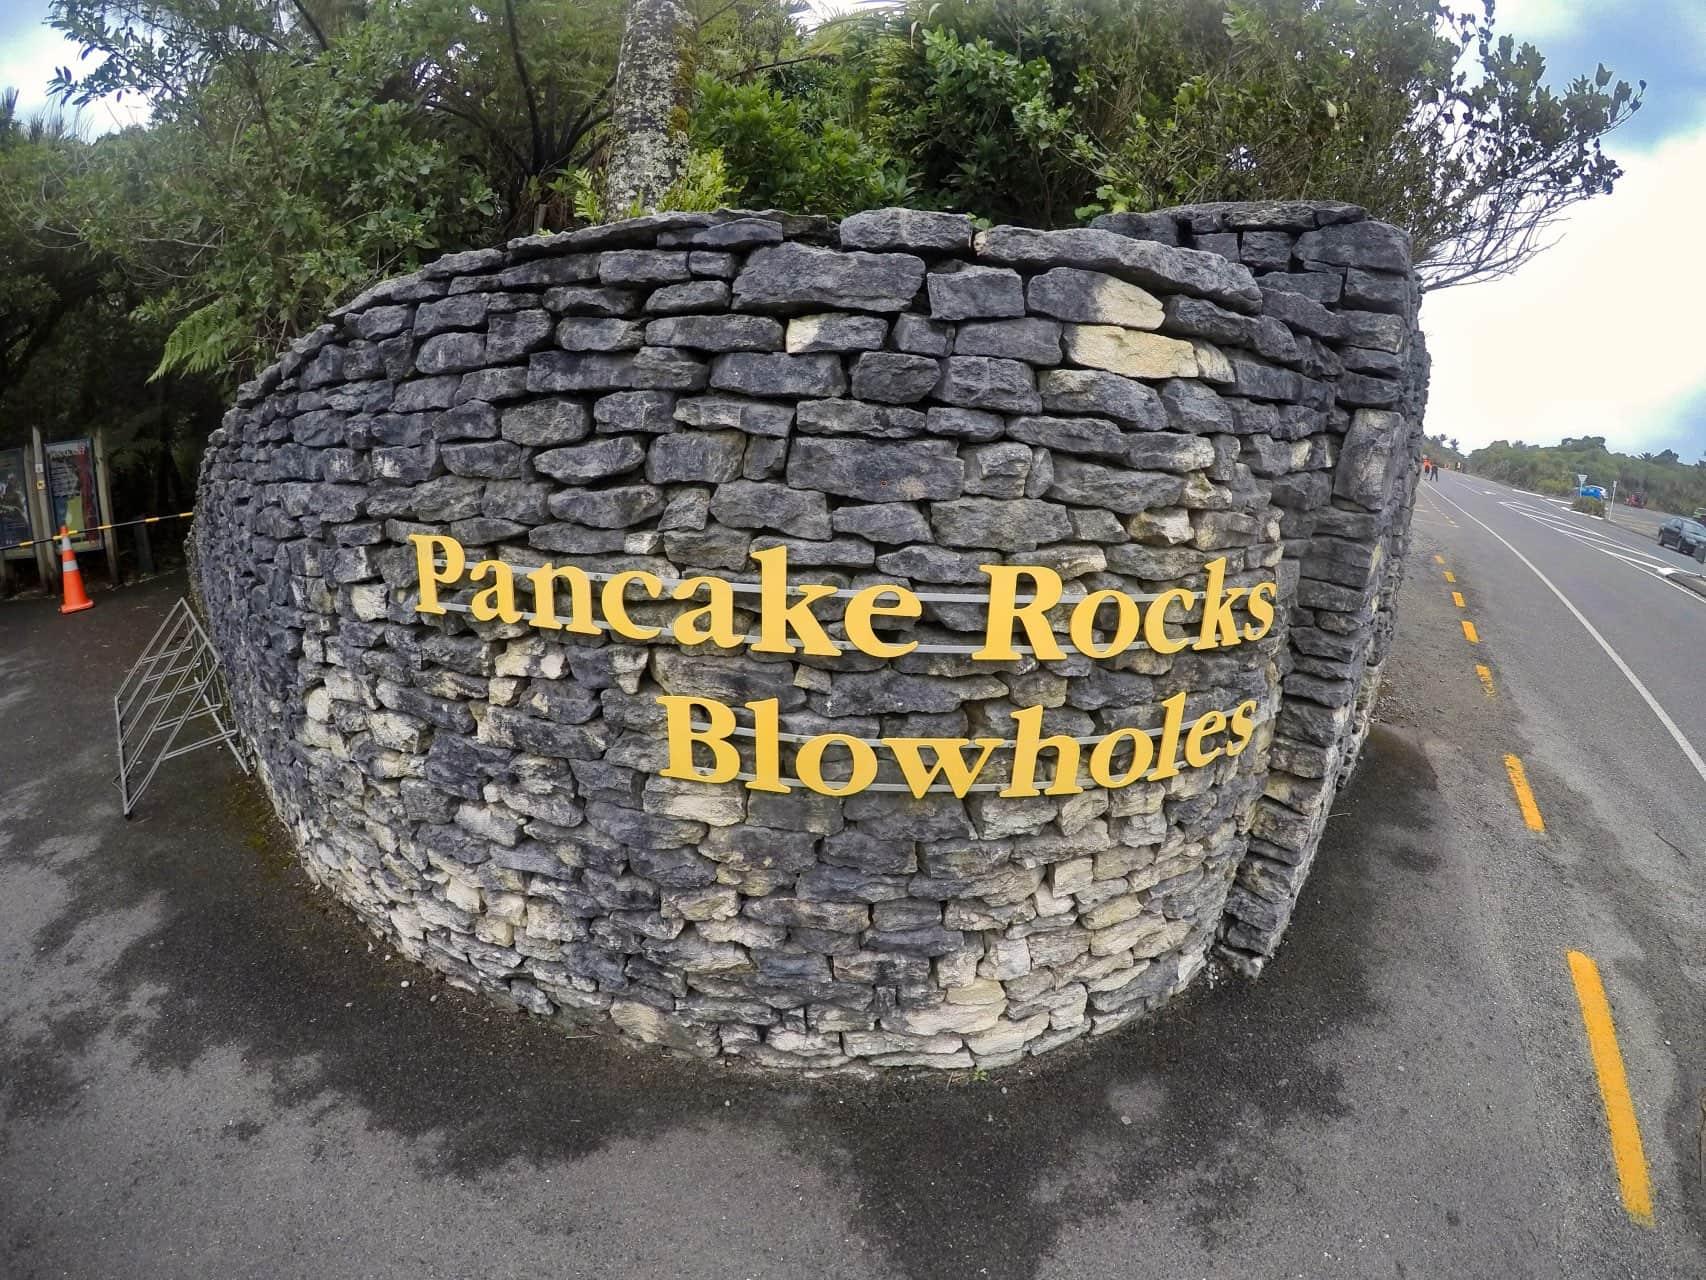 Panecake-Rocks-Blowholes-New-Zealand-entrance